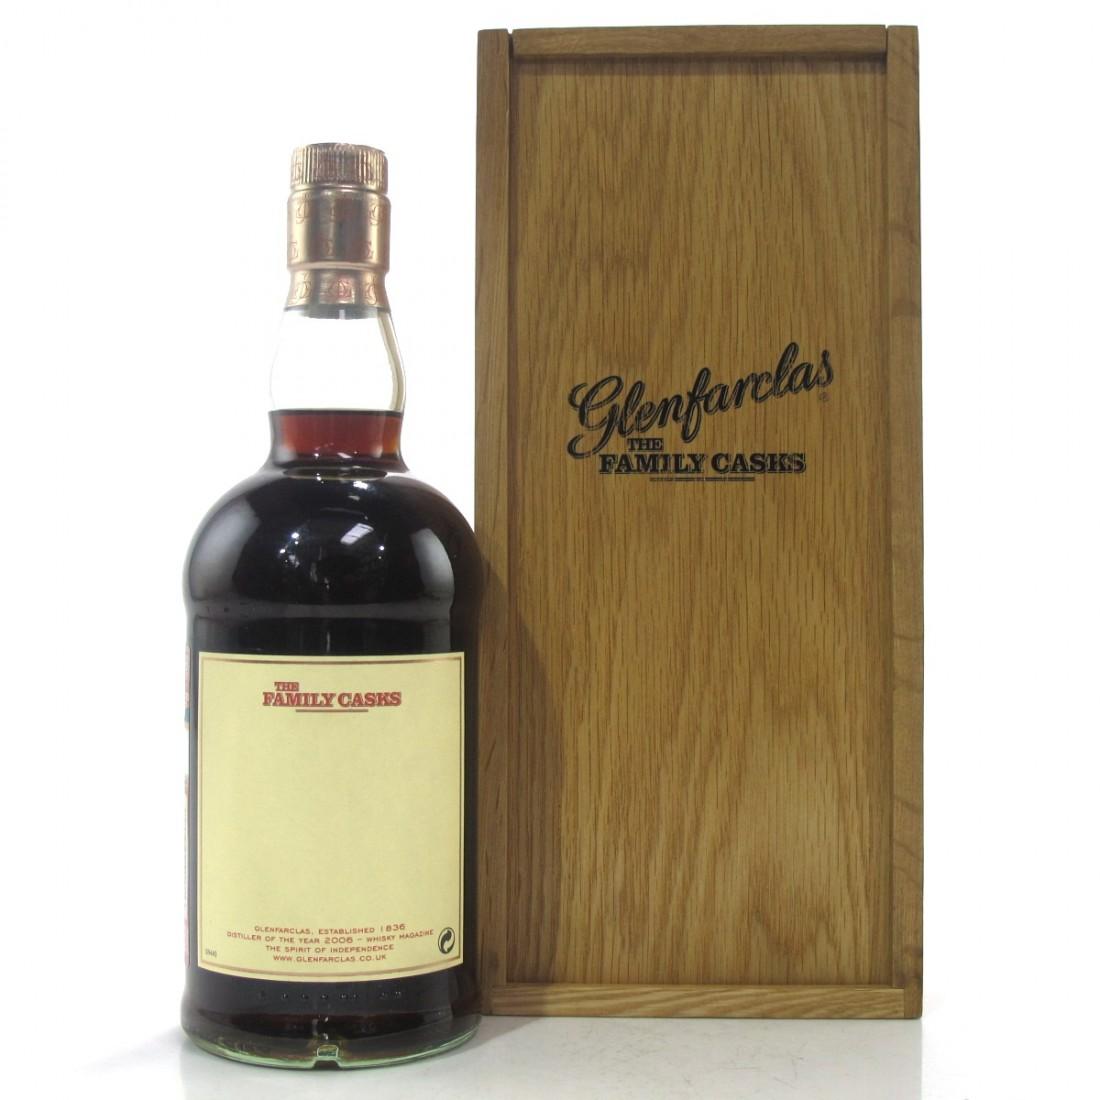 Glenfarclas 1959 Family Cask #1838 / Release IV